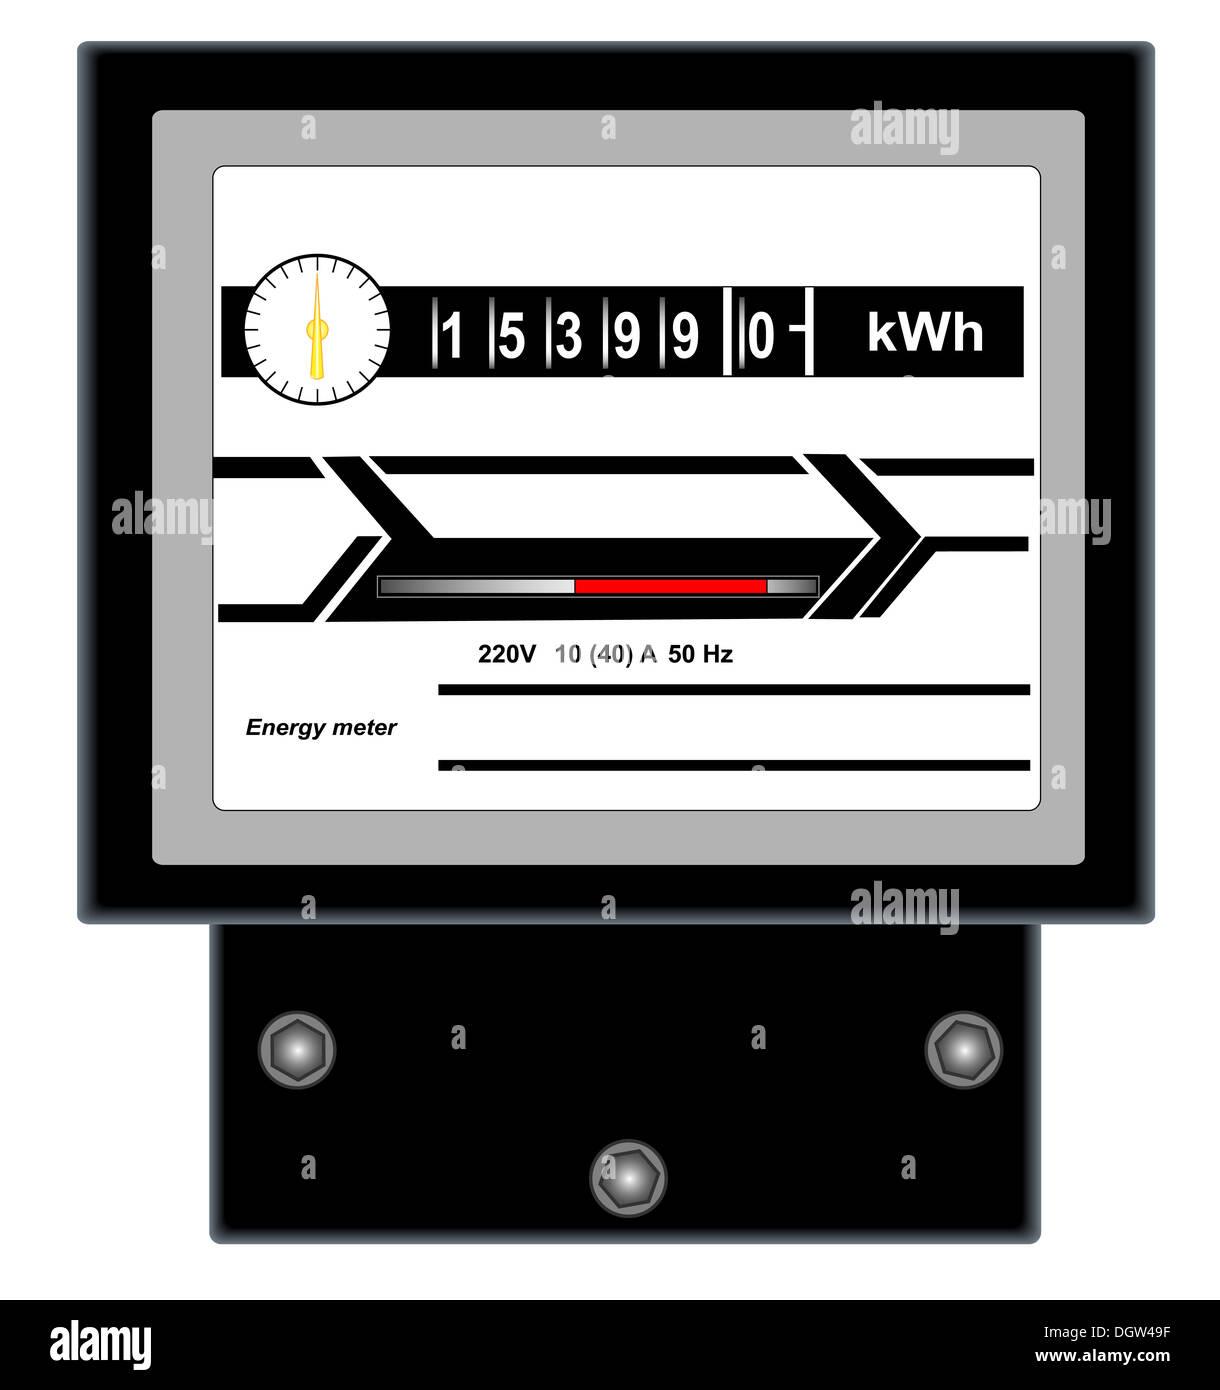 Energy meter - Stock Image